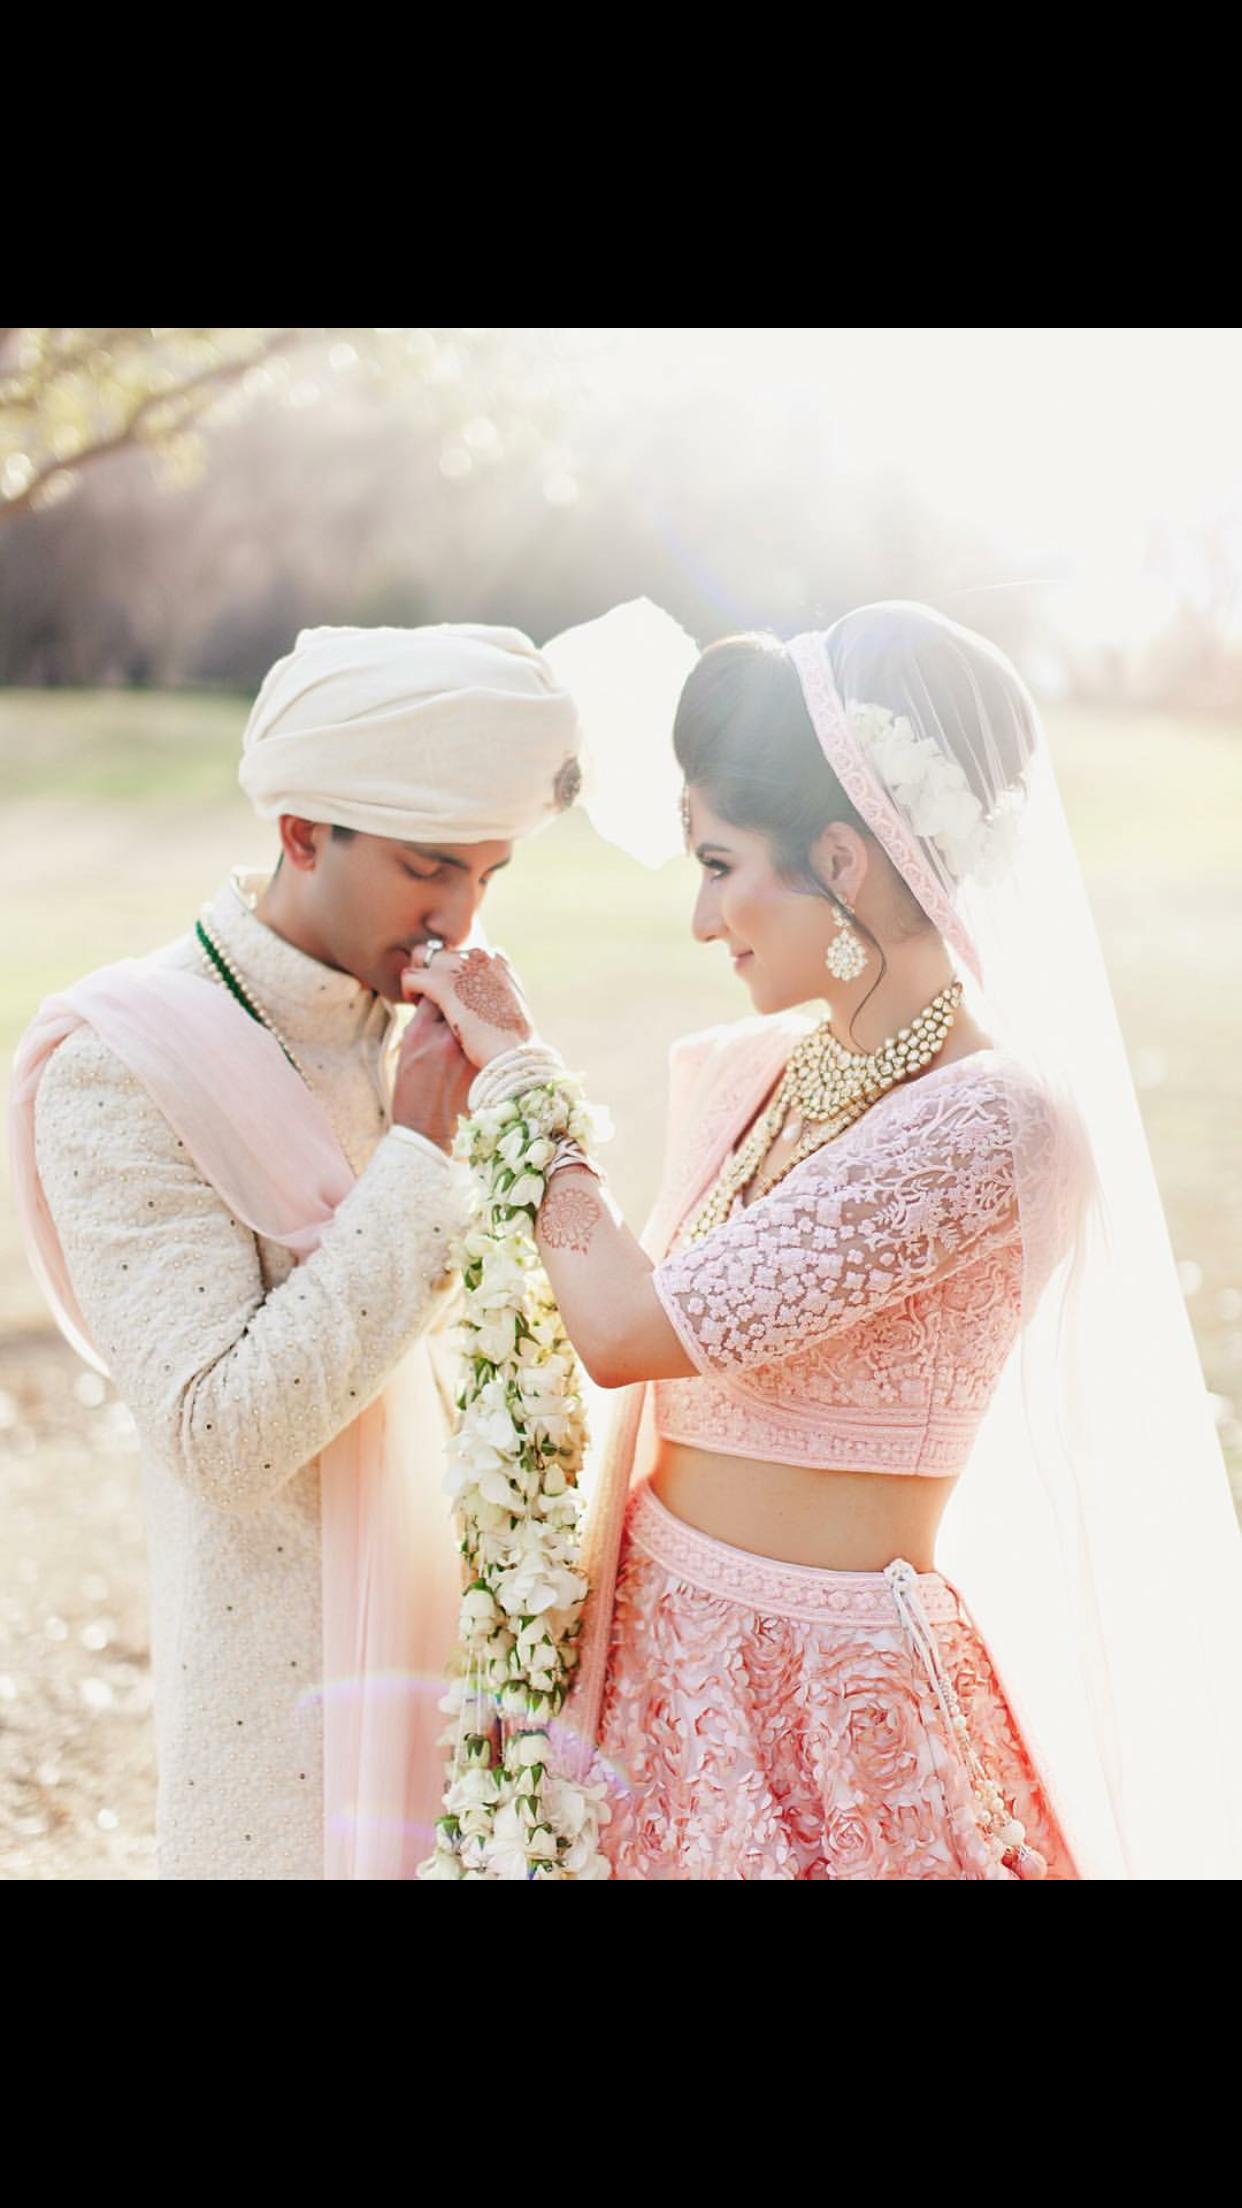 Pin by shanza taherani on wedding portrait shoot inspo with rabiah